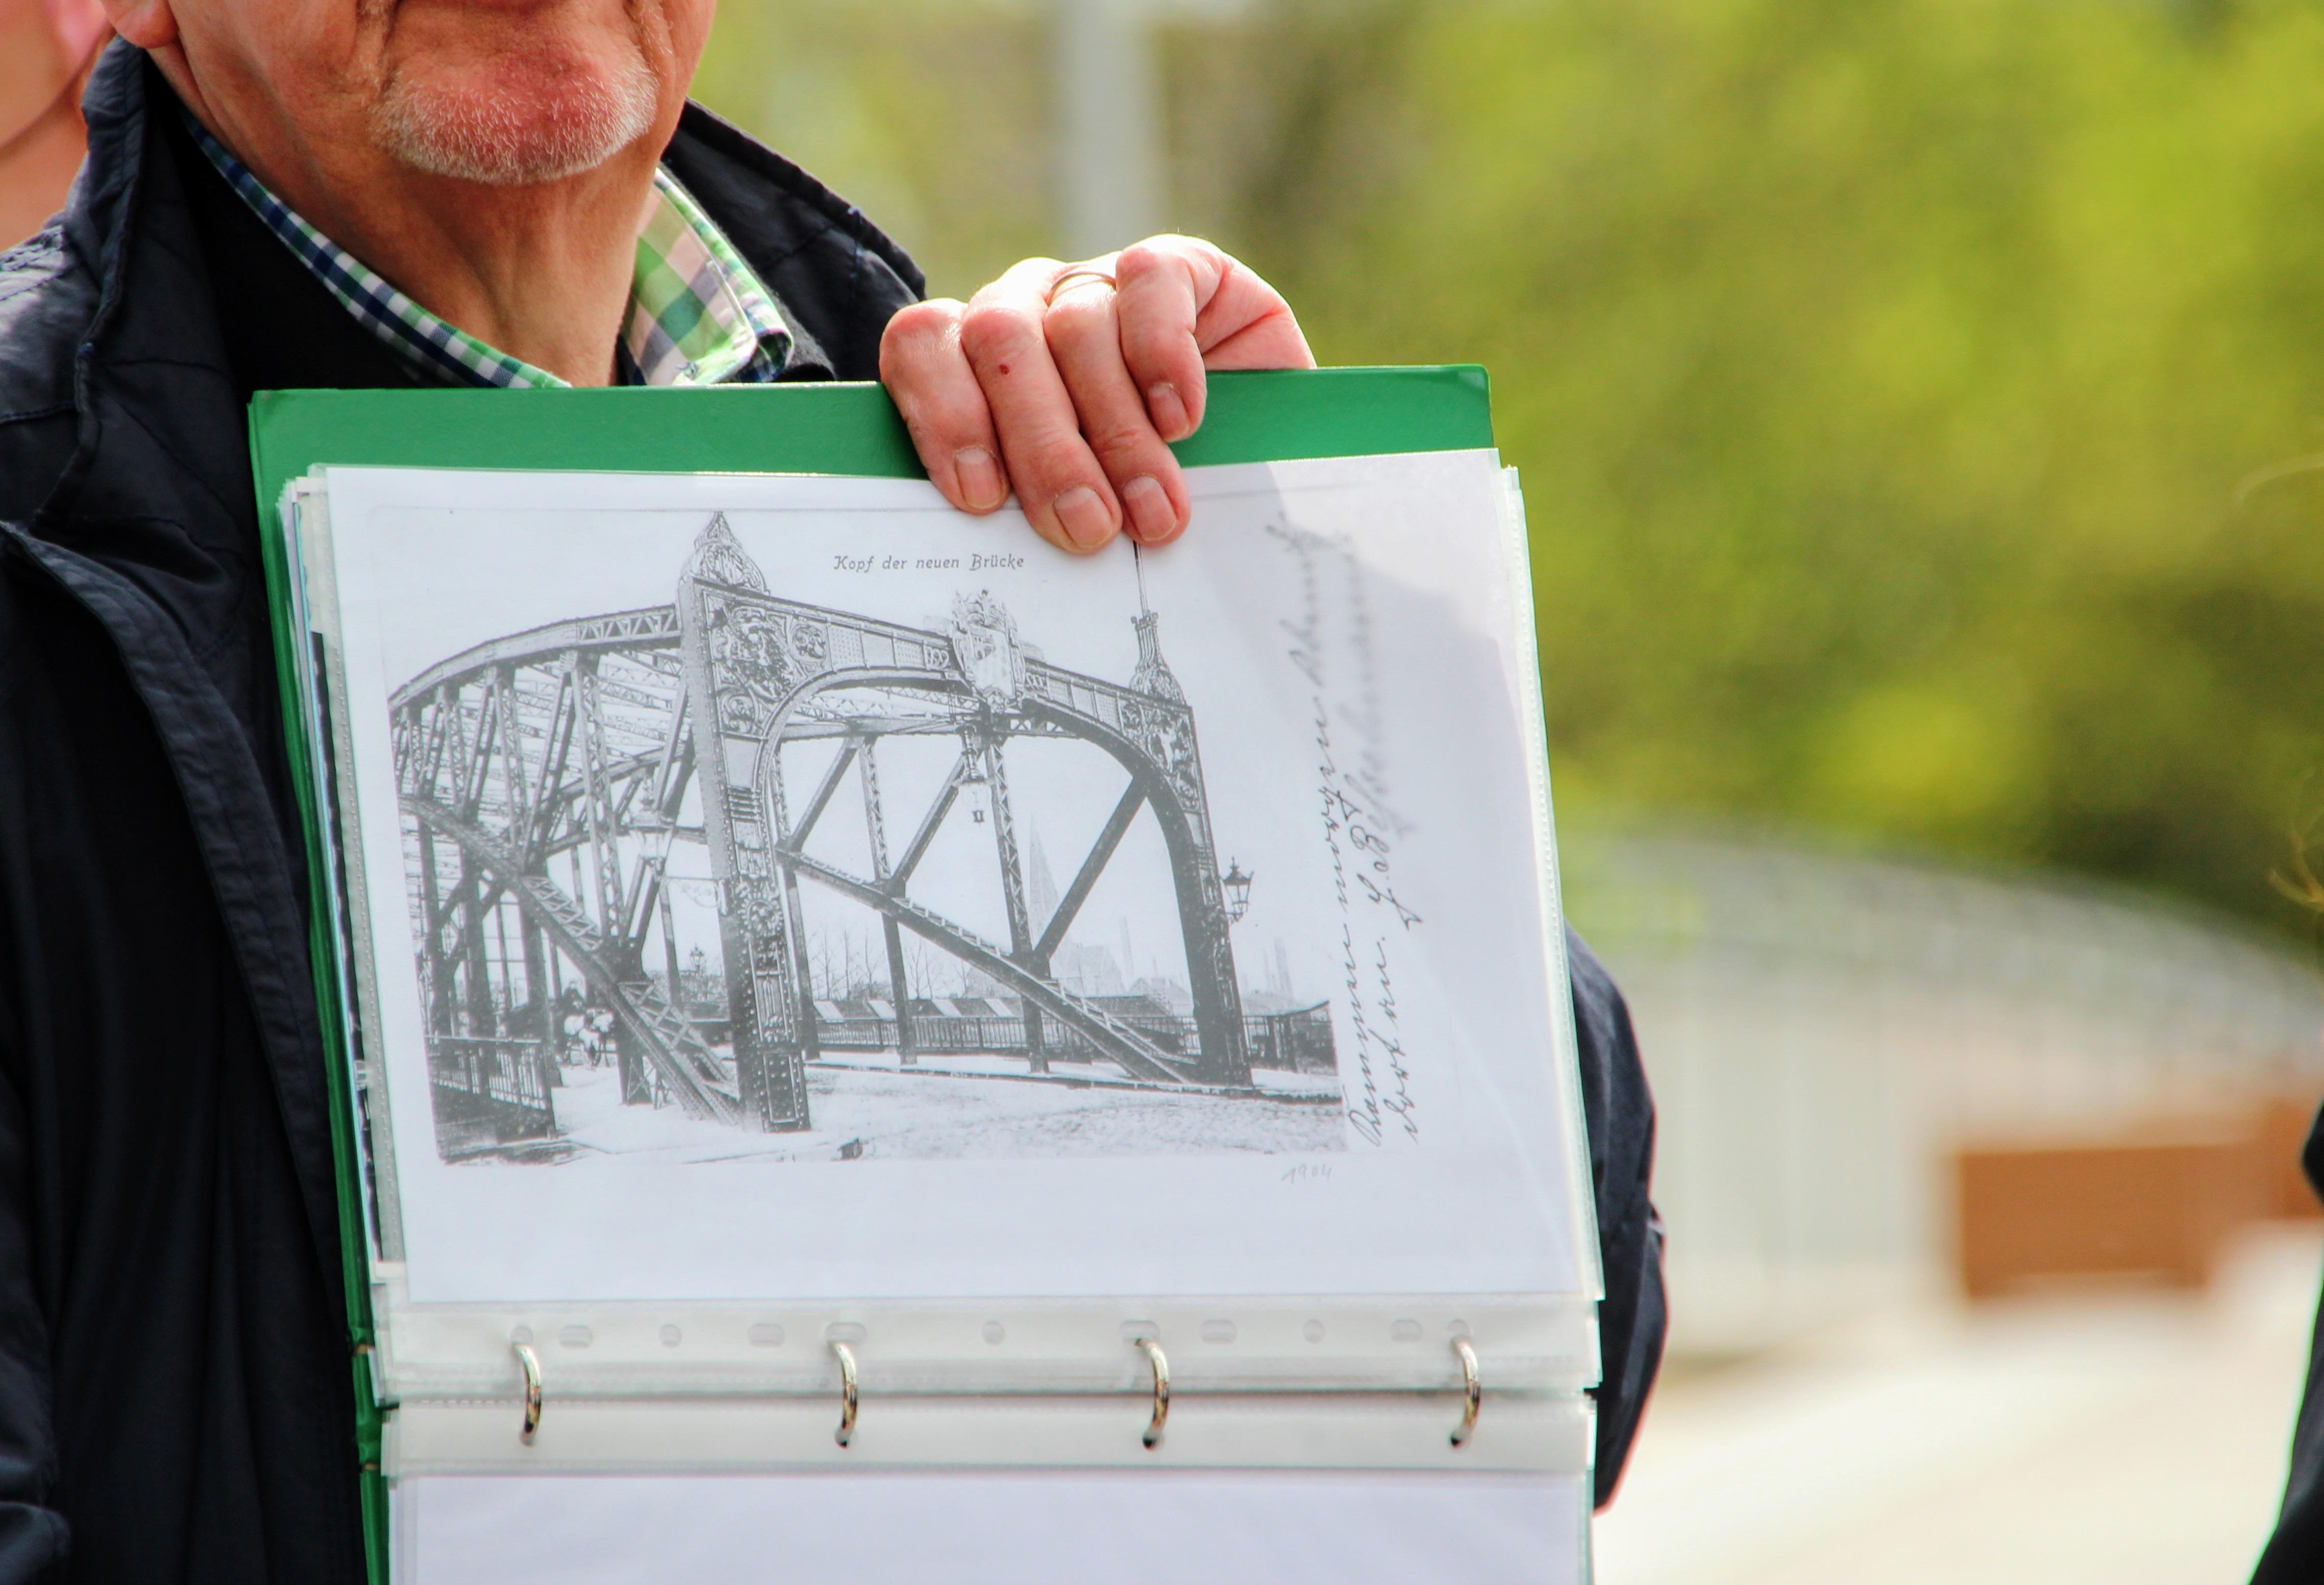 Gambar Tangan Jembatan Musim Semi Dortmund Gambar Pensil H